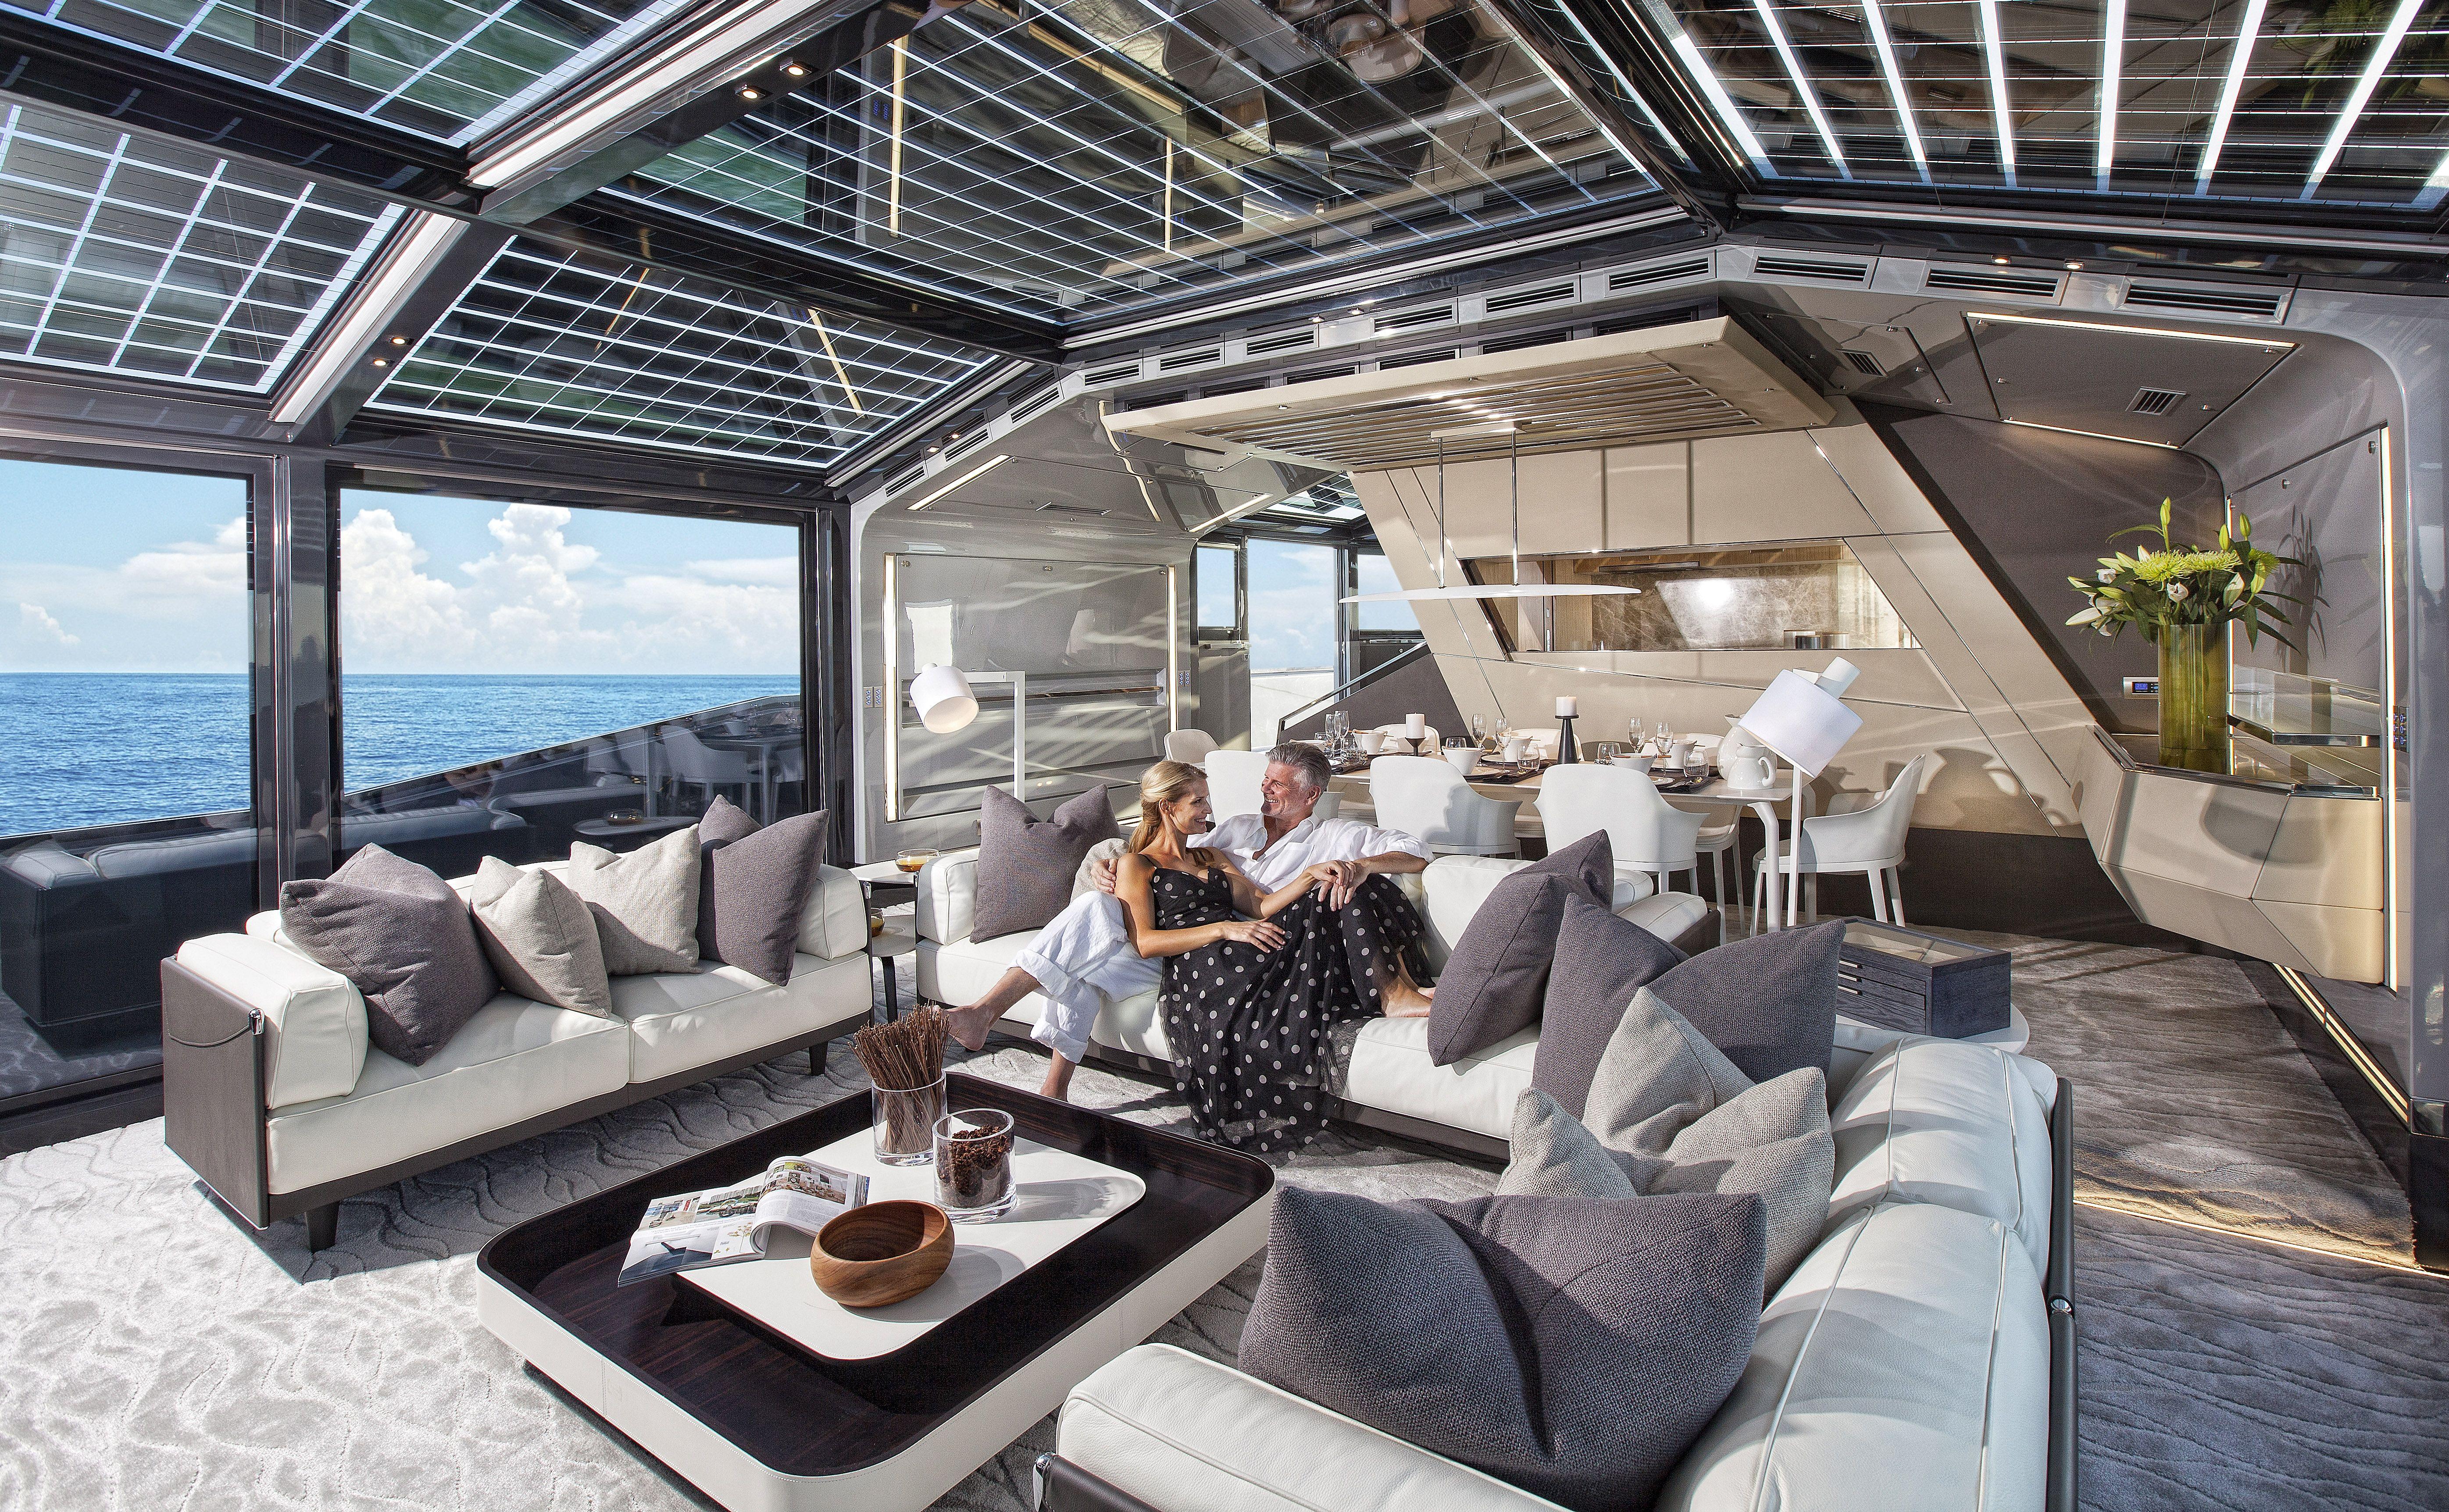 Arcadia 105 Yacht Rj With Images Yacht Design Yacht Interior